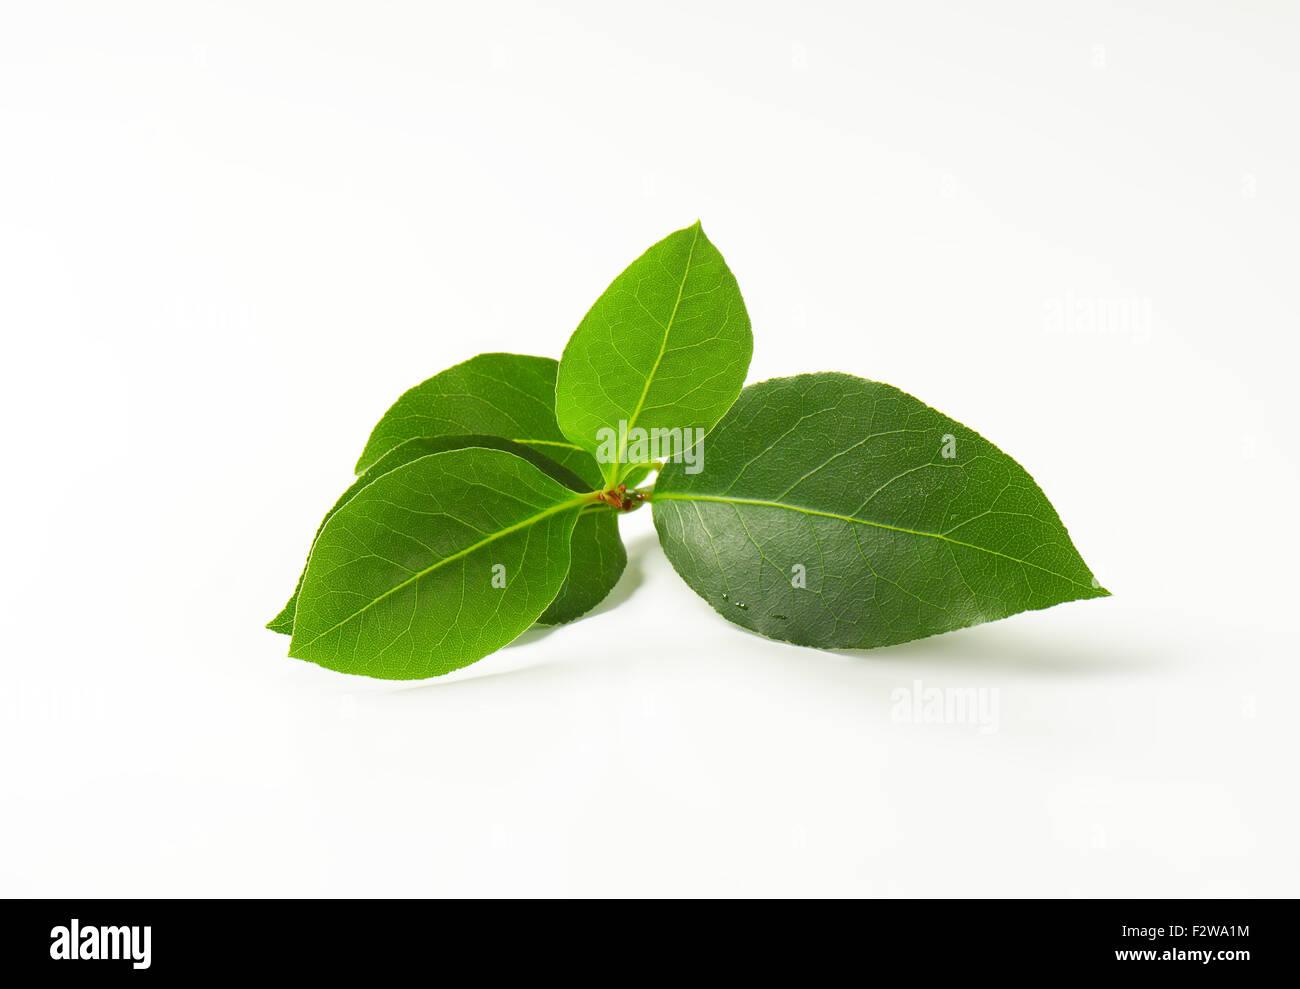 twig of fresh bay leaves on white background - Stock Image